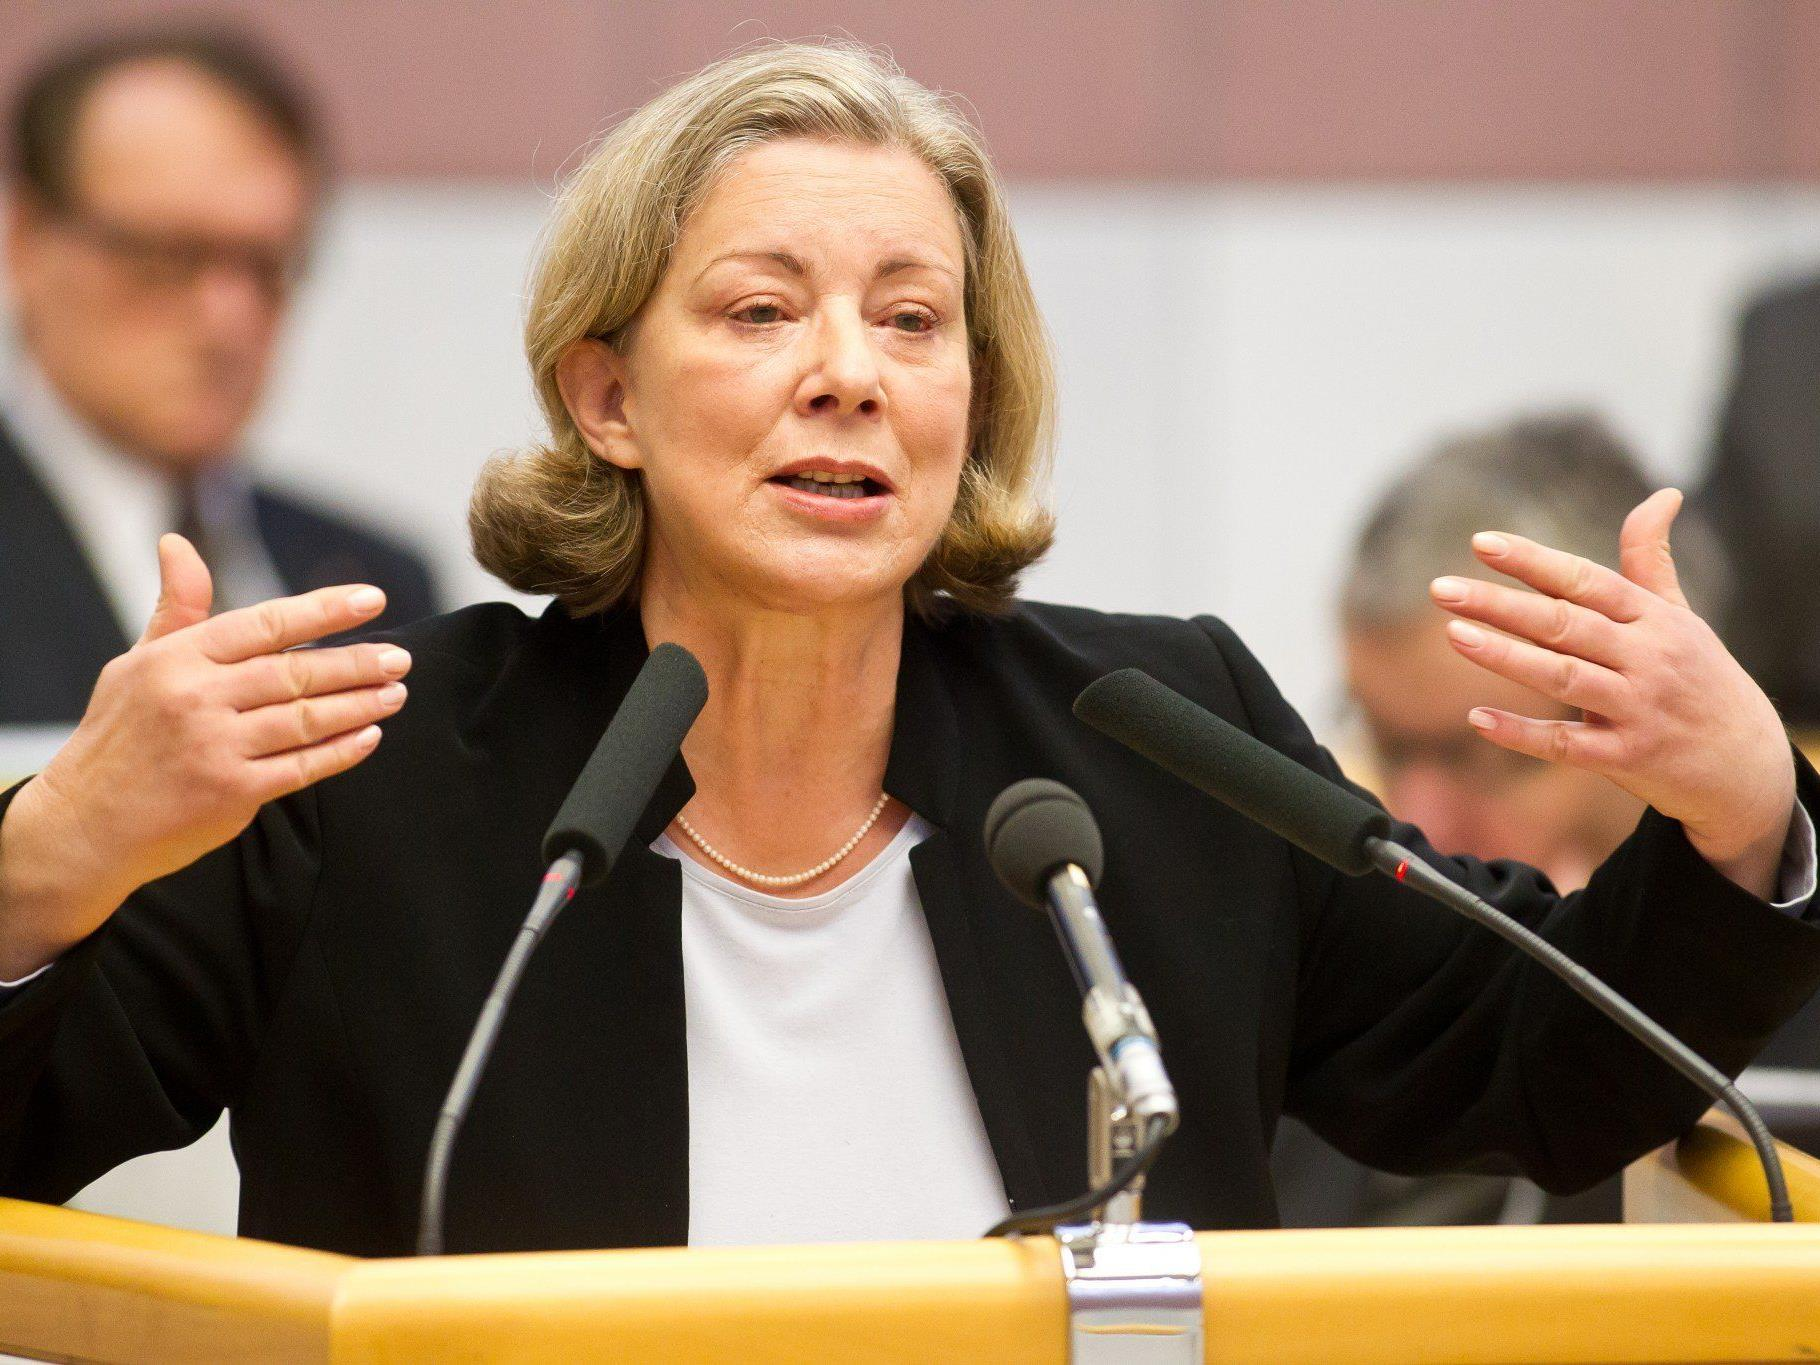 Sprickler-Falschlunger mit massiver Kritik an Bundes-SPÖ.